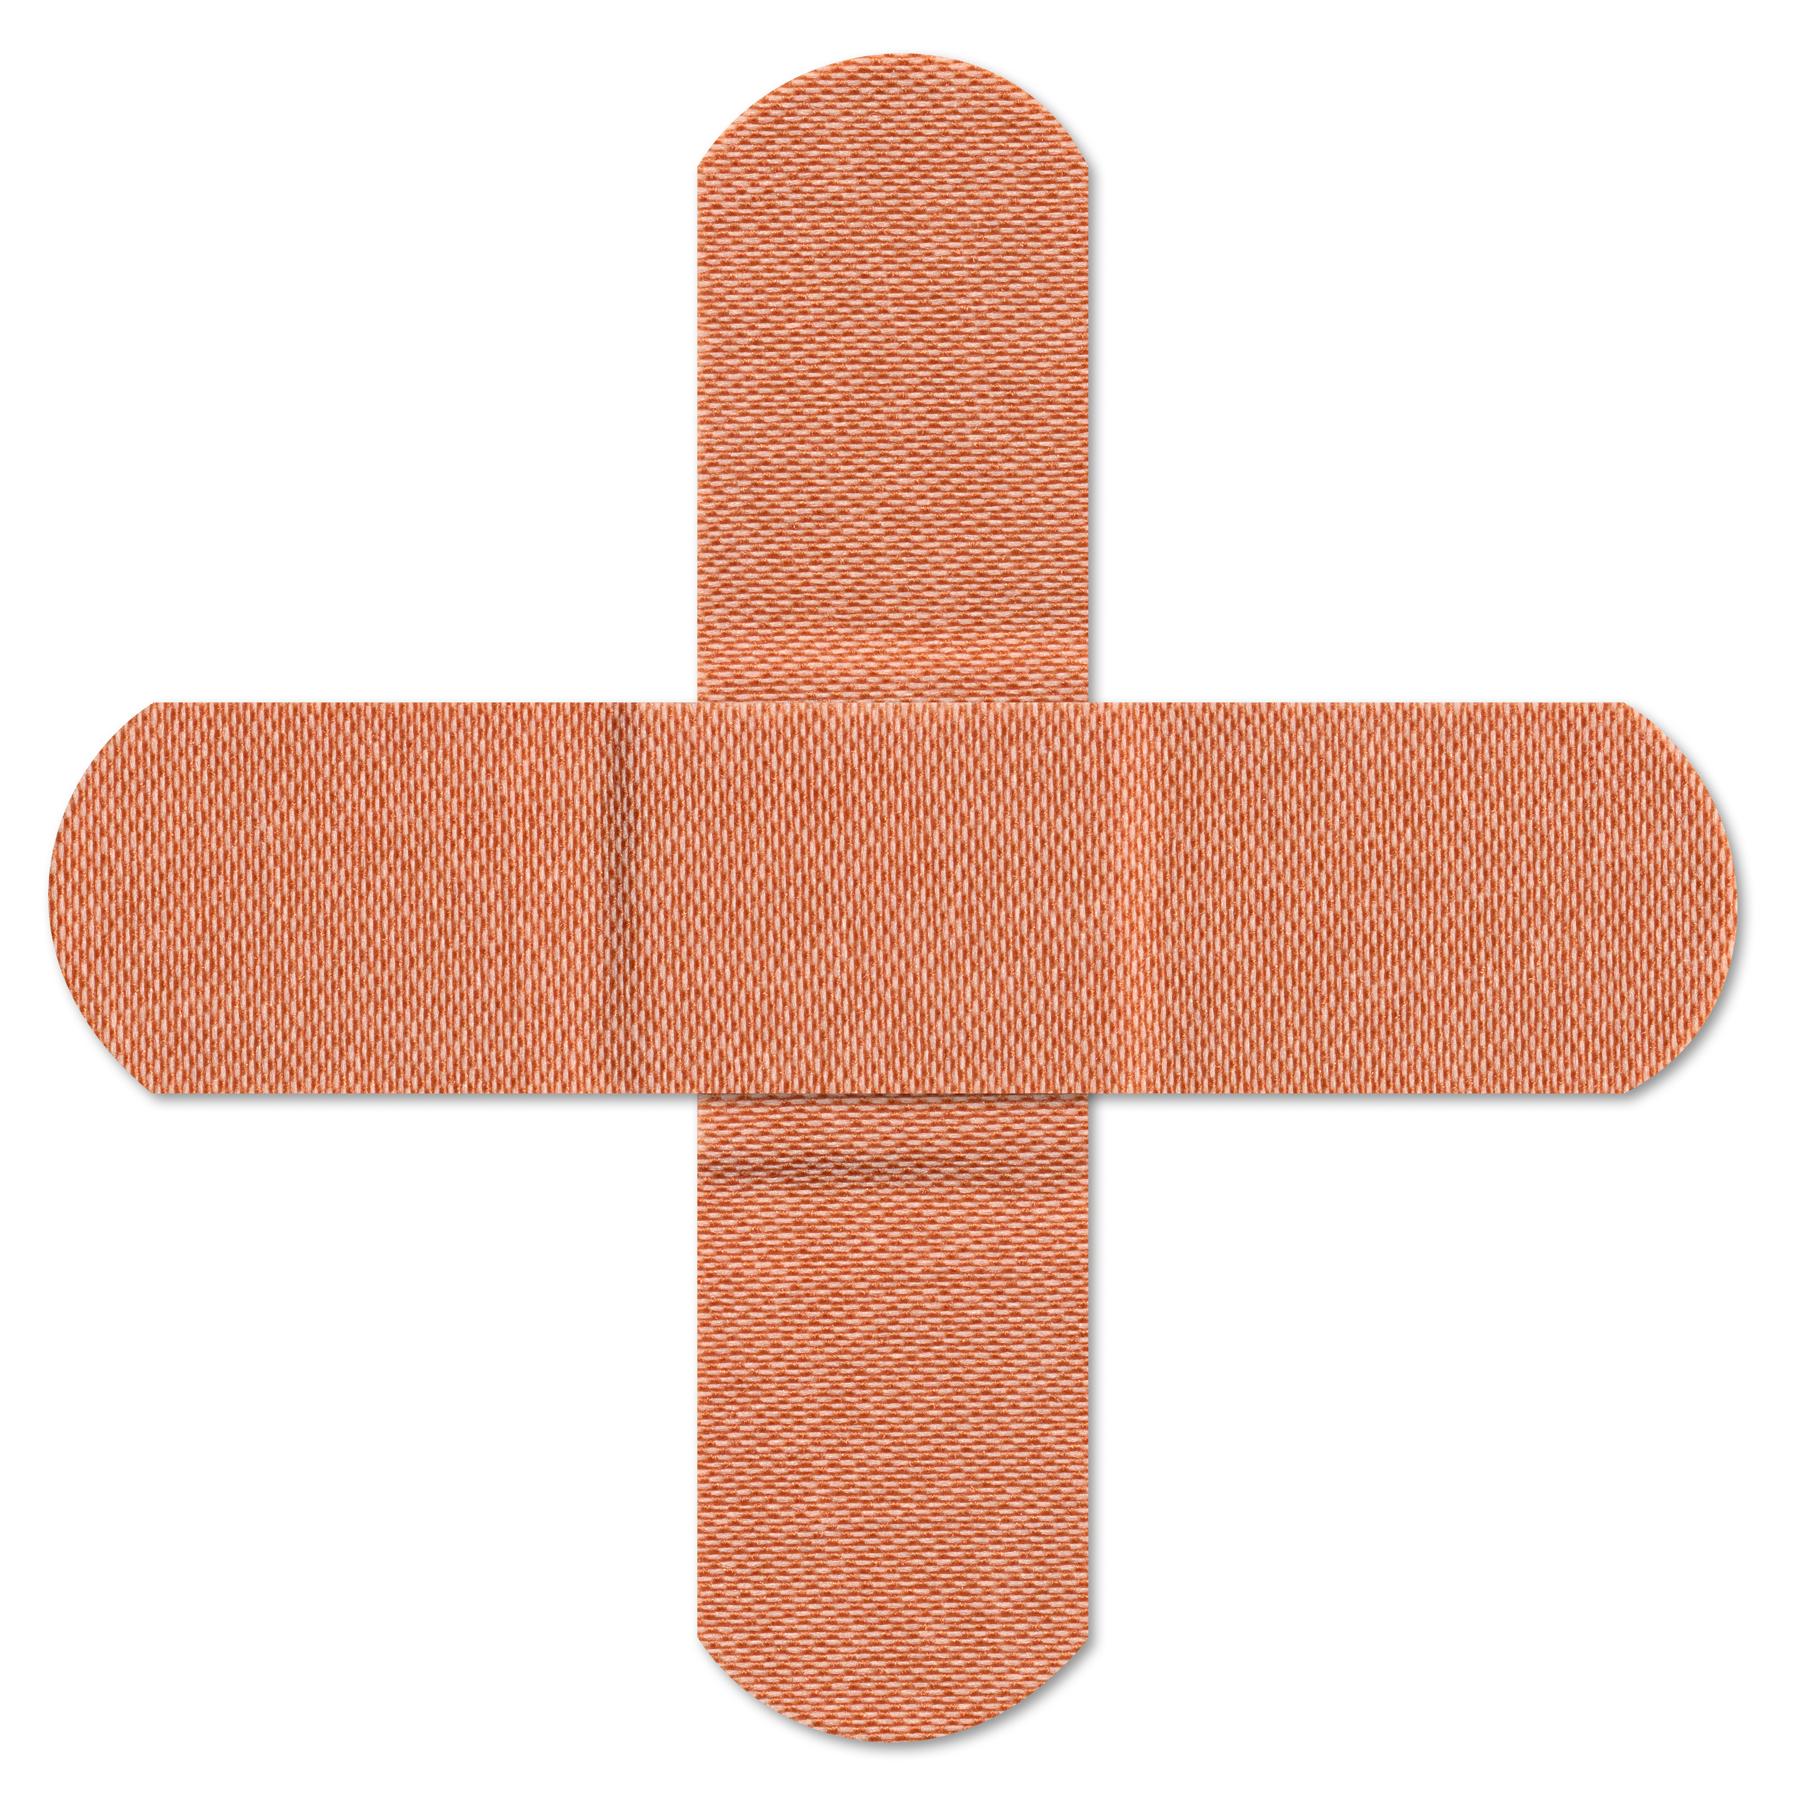 Cross Bandages, 2, Remedy, Objects, Orange, HQ Photo